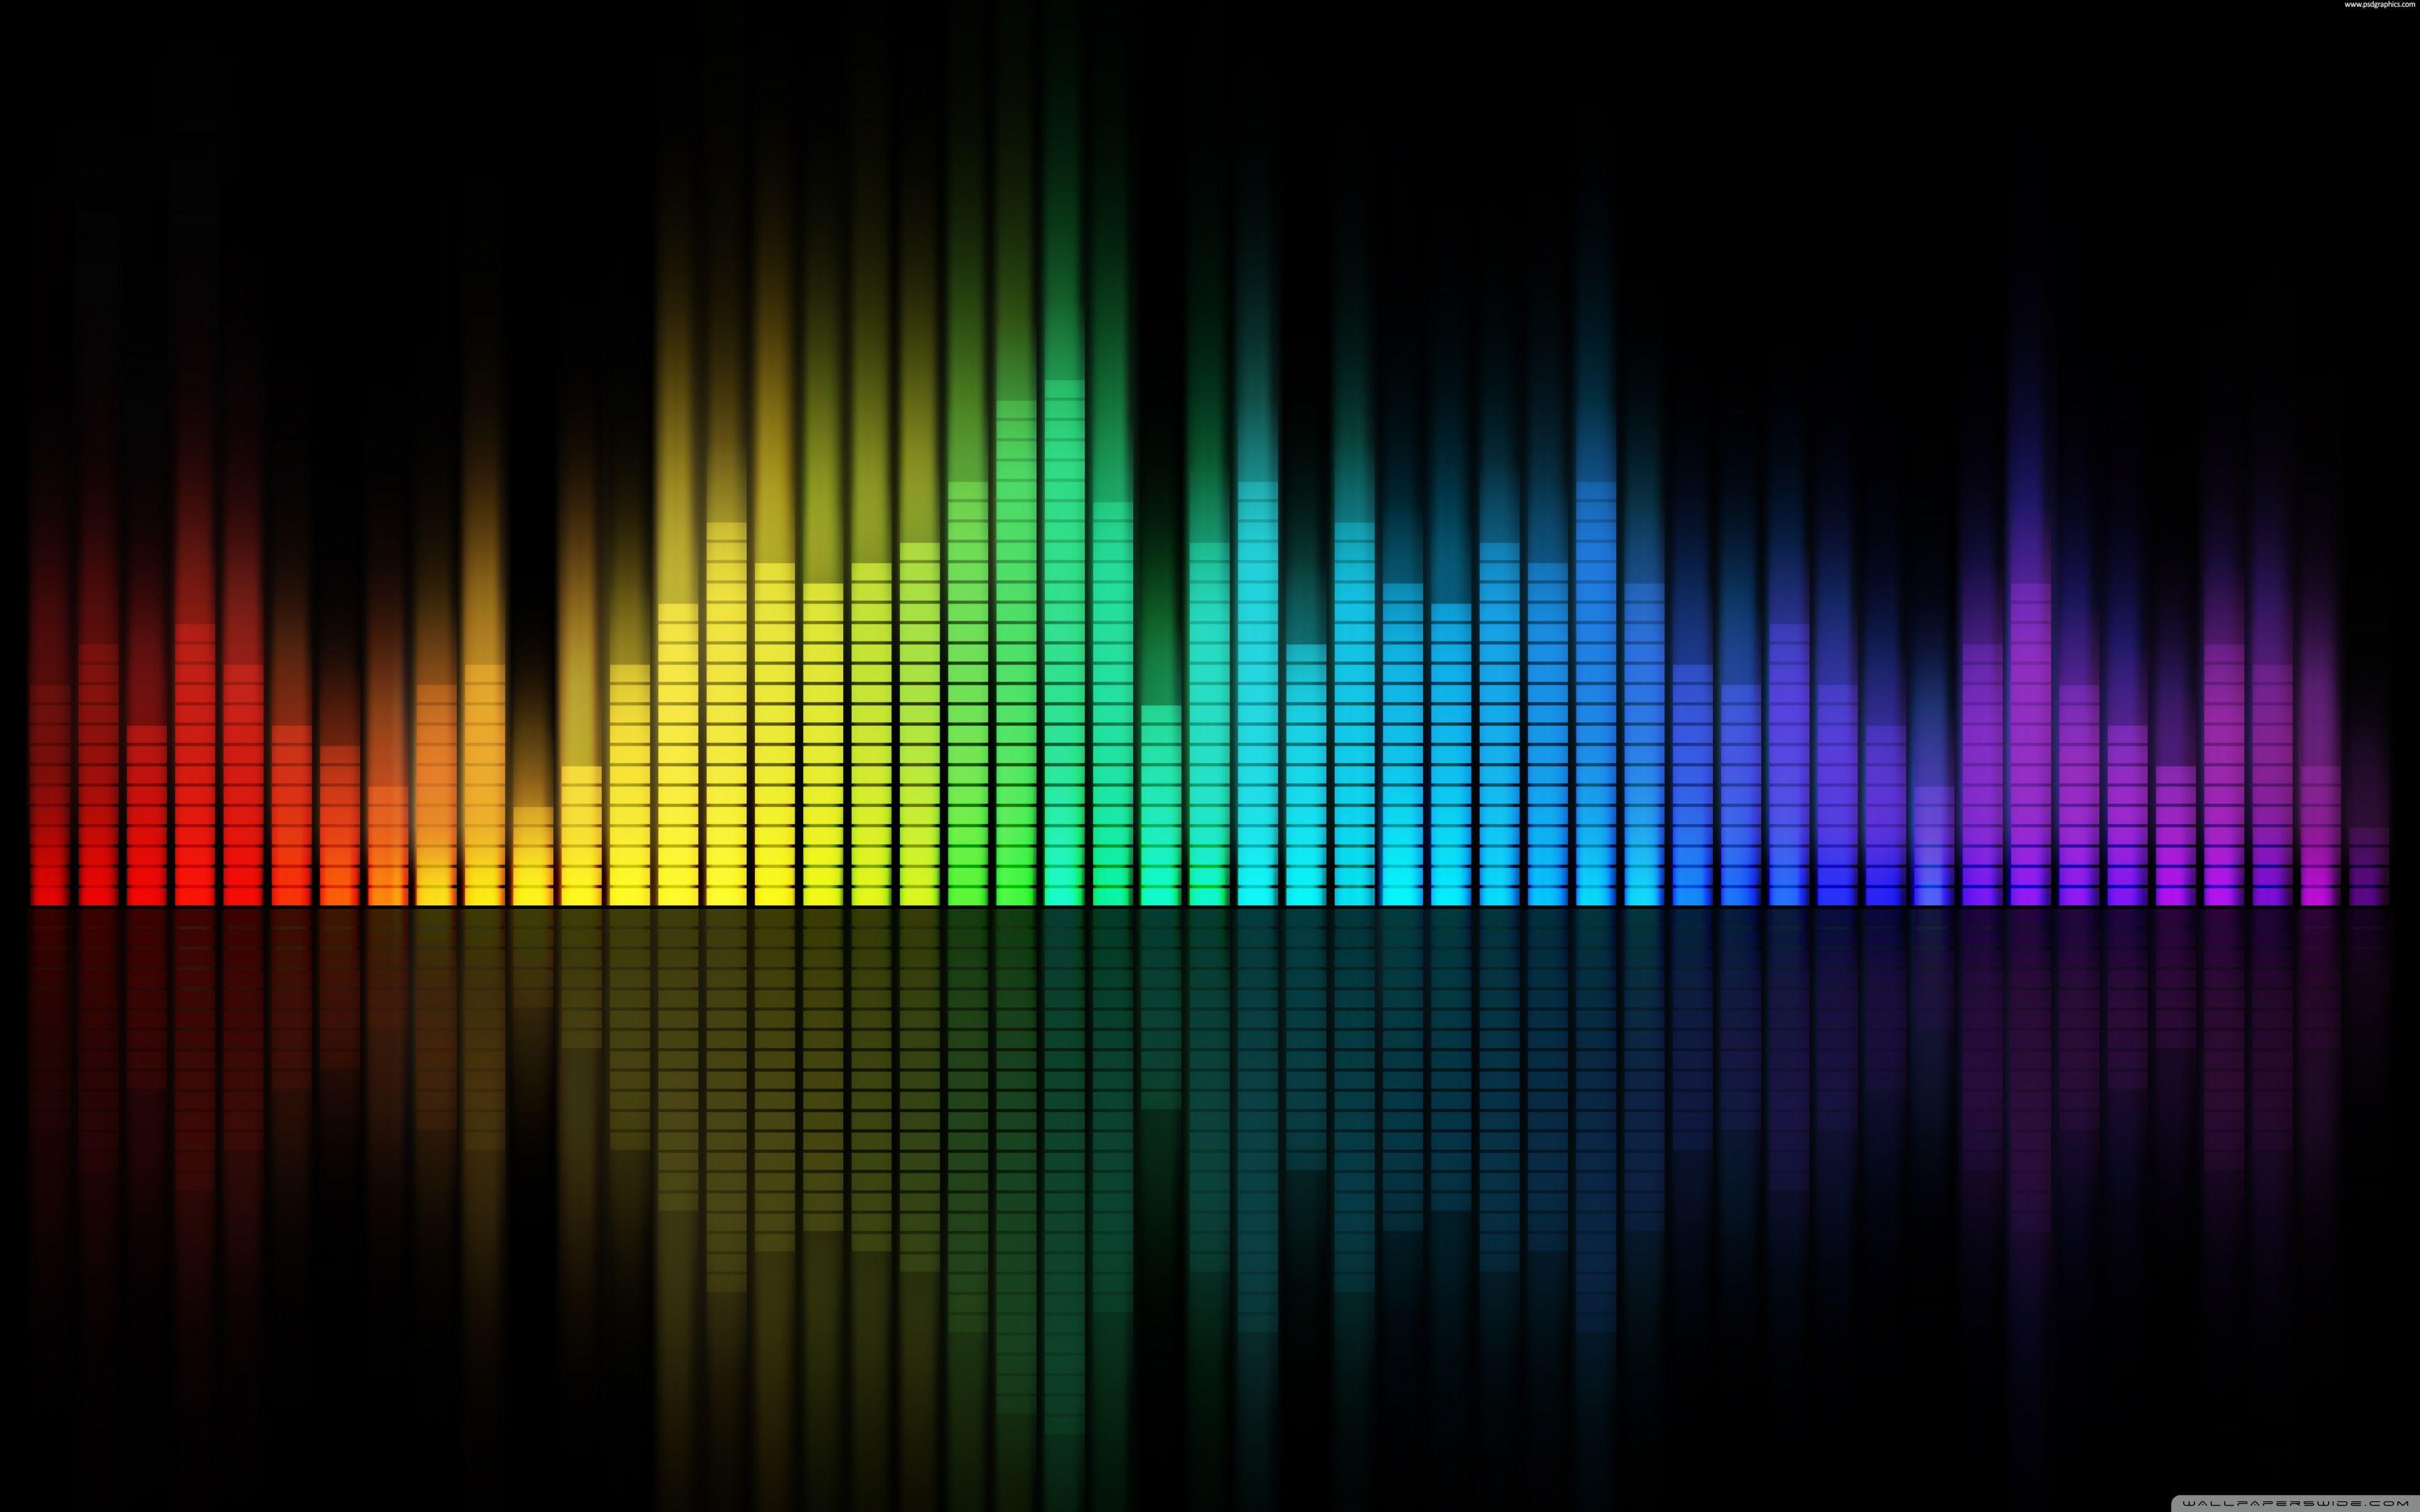 Most Inspiring Wallpaper Music Soundwave - 137c63e537f21308ac9afef6e48db444  Pictures_597691.jpg